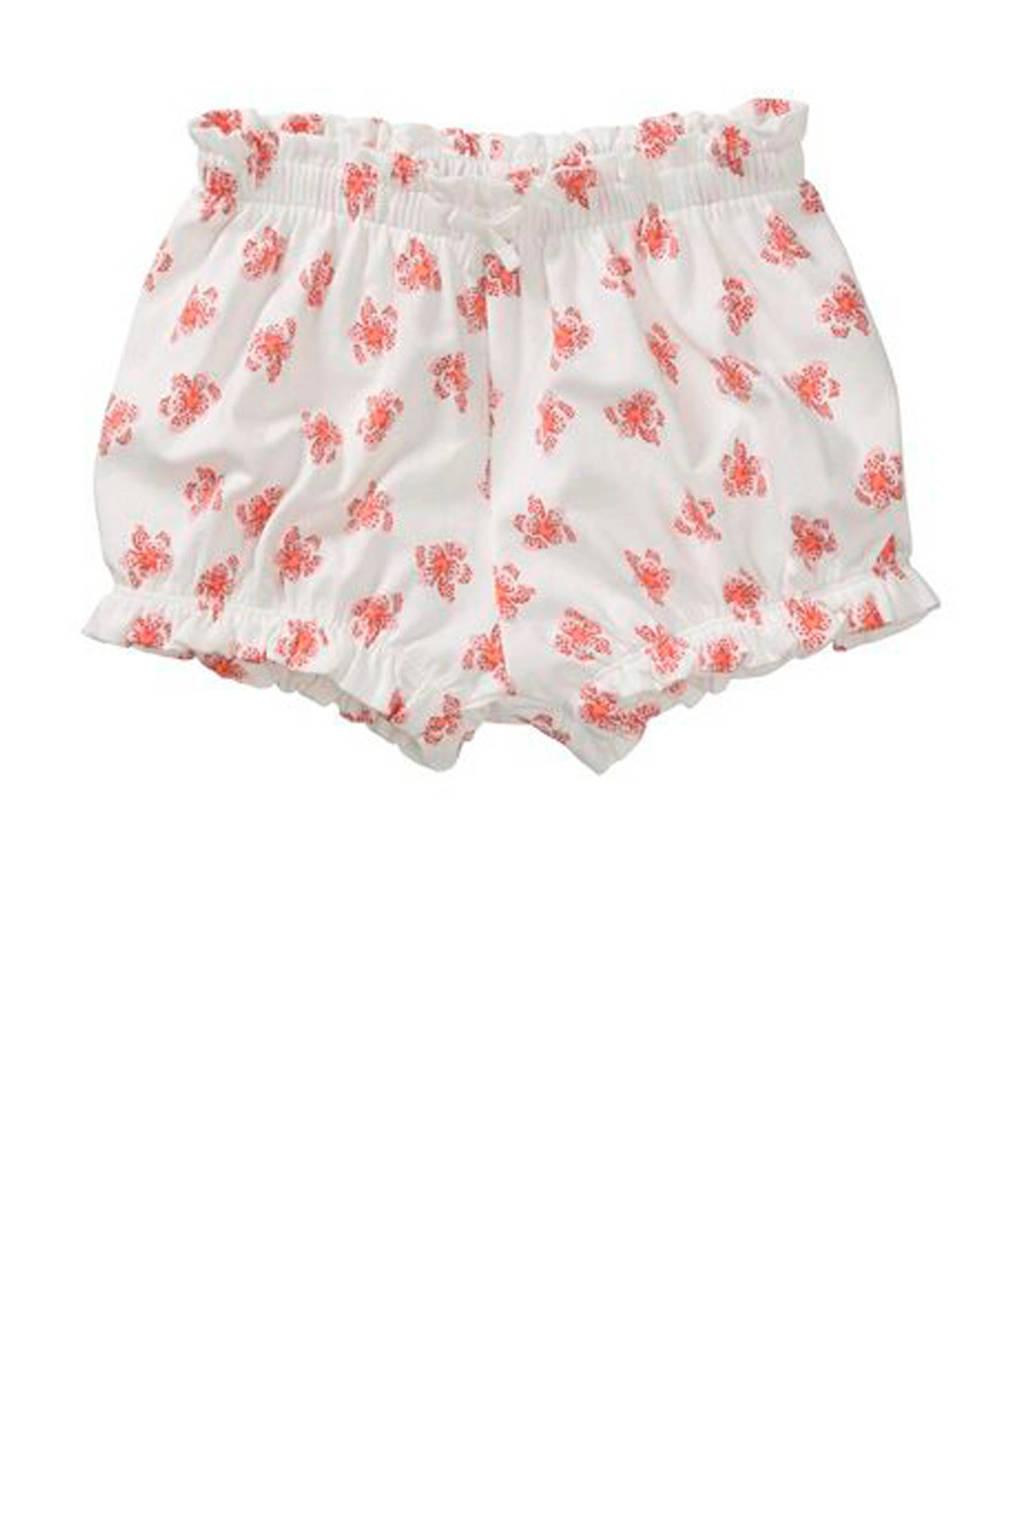 HEMA gebloemde sweatshort wit/roze, Wit/roze